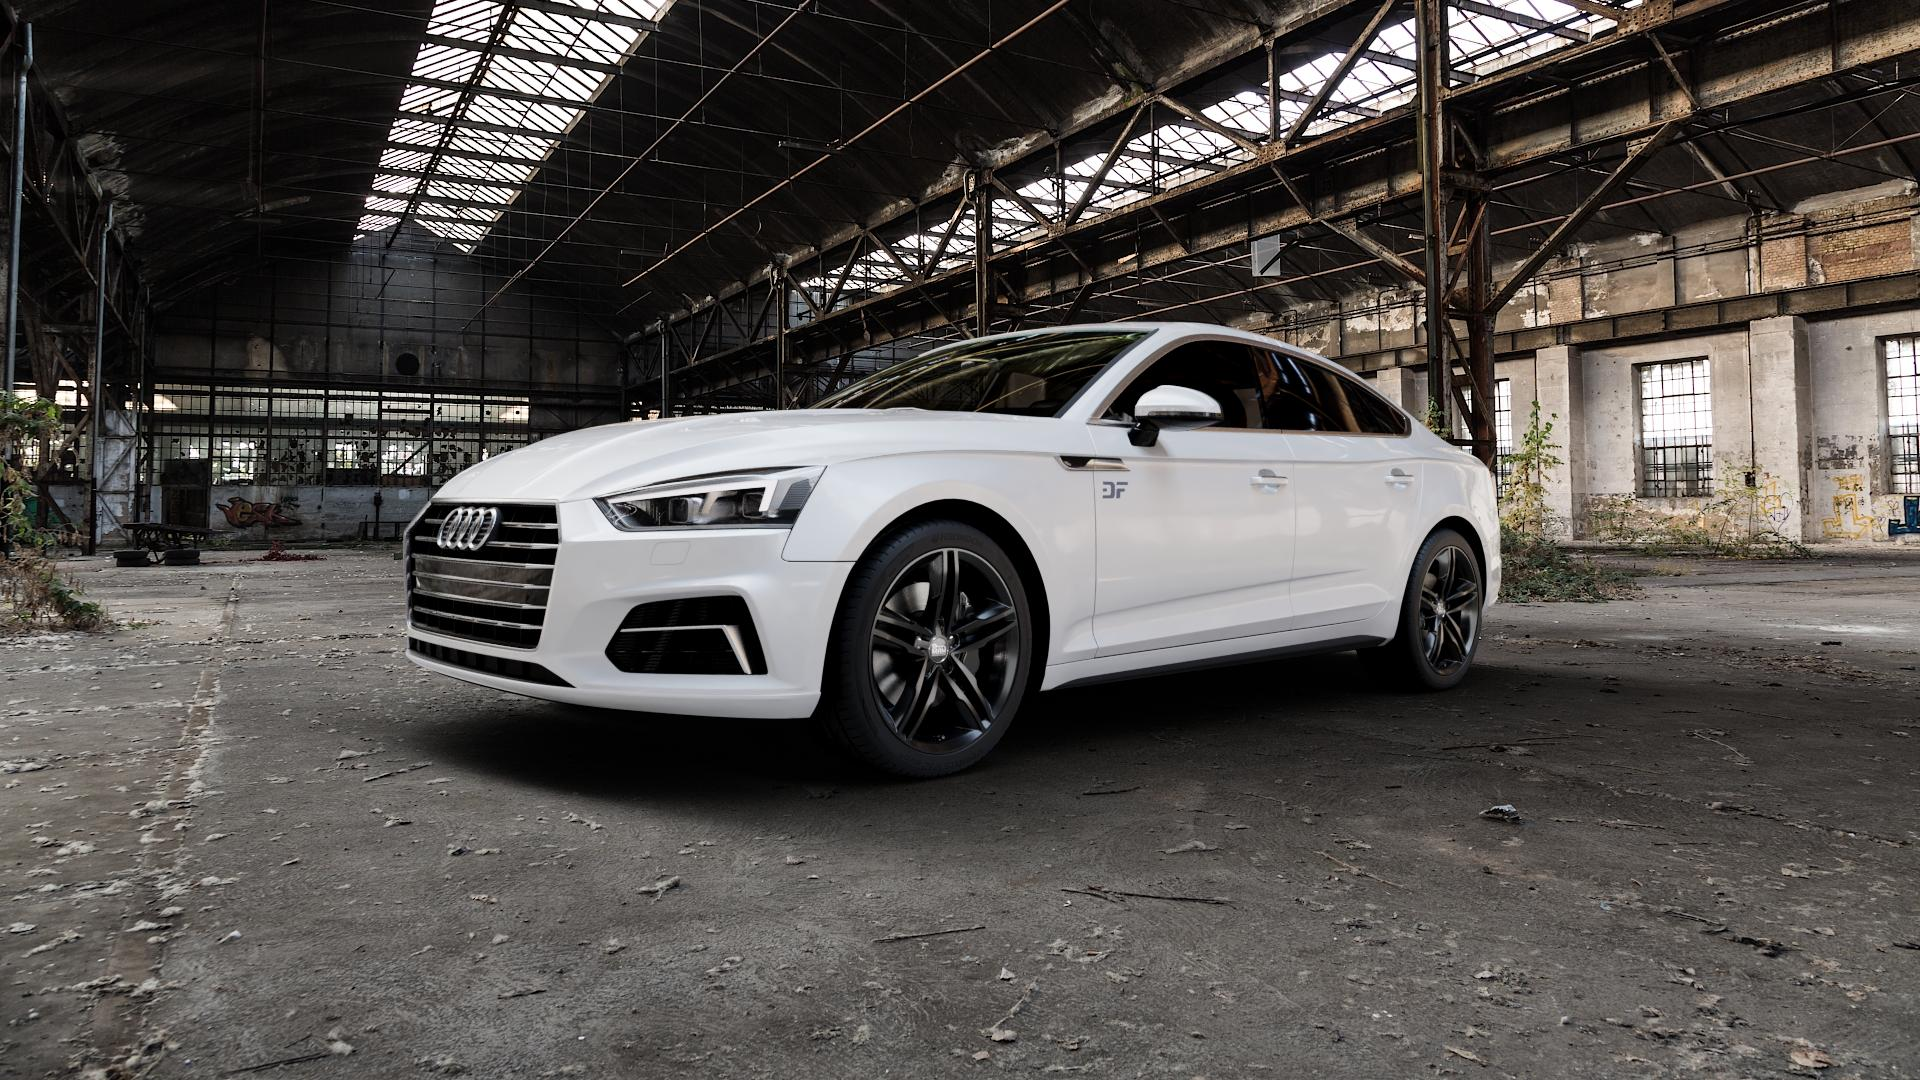 MAM A1 BLACK PAINTED Felge mit Reifen schwarz in 18Zoll Winterfelge Alufelge auf weissem Audi A5 Typ B9 (Sportback) 2,0l TDI 140kW (190 PS) quattro TFSI 185kW (252 3,0l 160kW (218 200kW (272 1,4l 110kW (150 183kW (249 g-tron 125kW (170 Mild-Hybrid 100kW (136 210kW (286 45 180kW (245 35 40 50 170kW (231 120kW (163 30 ⬇️ mit 15mm Ti